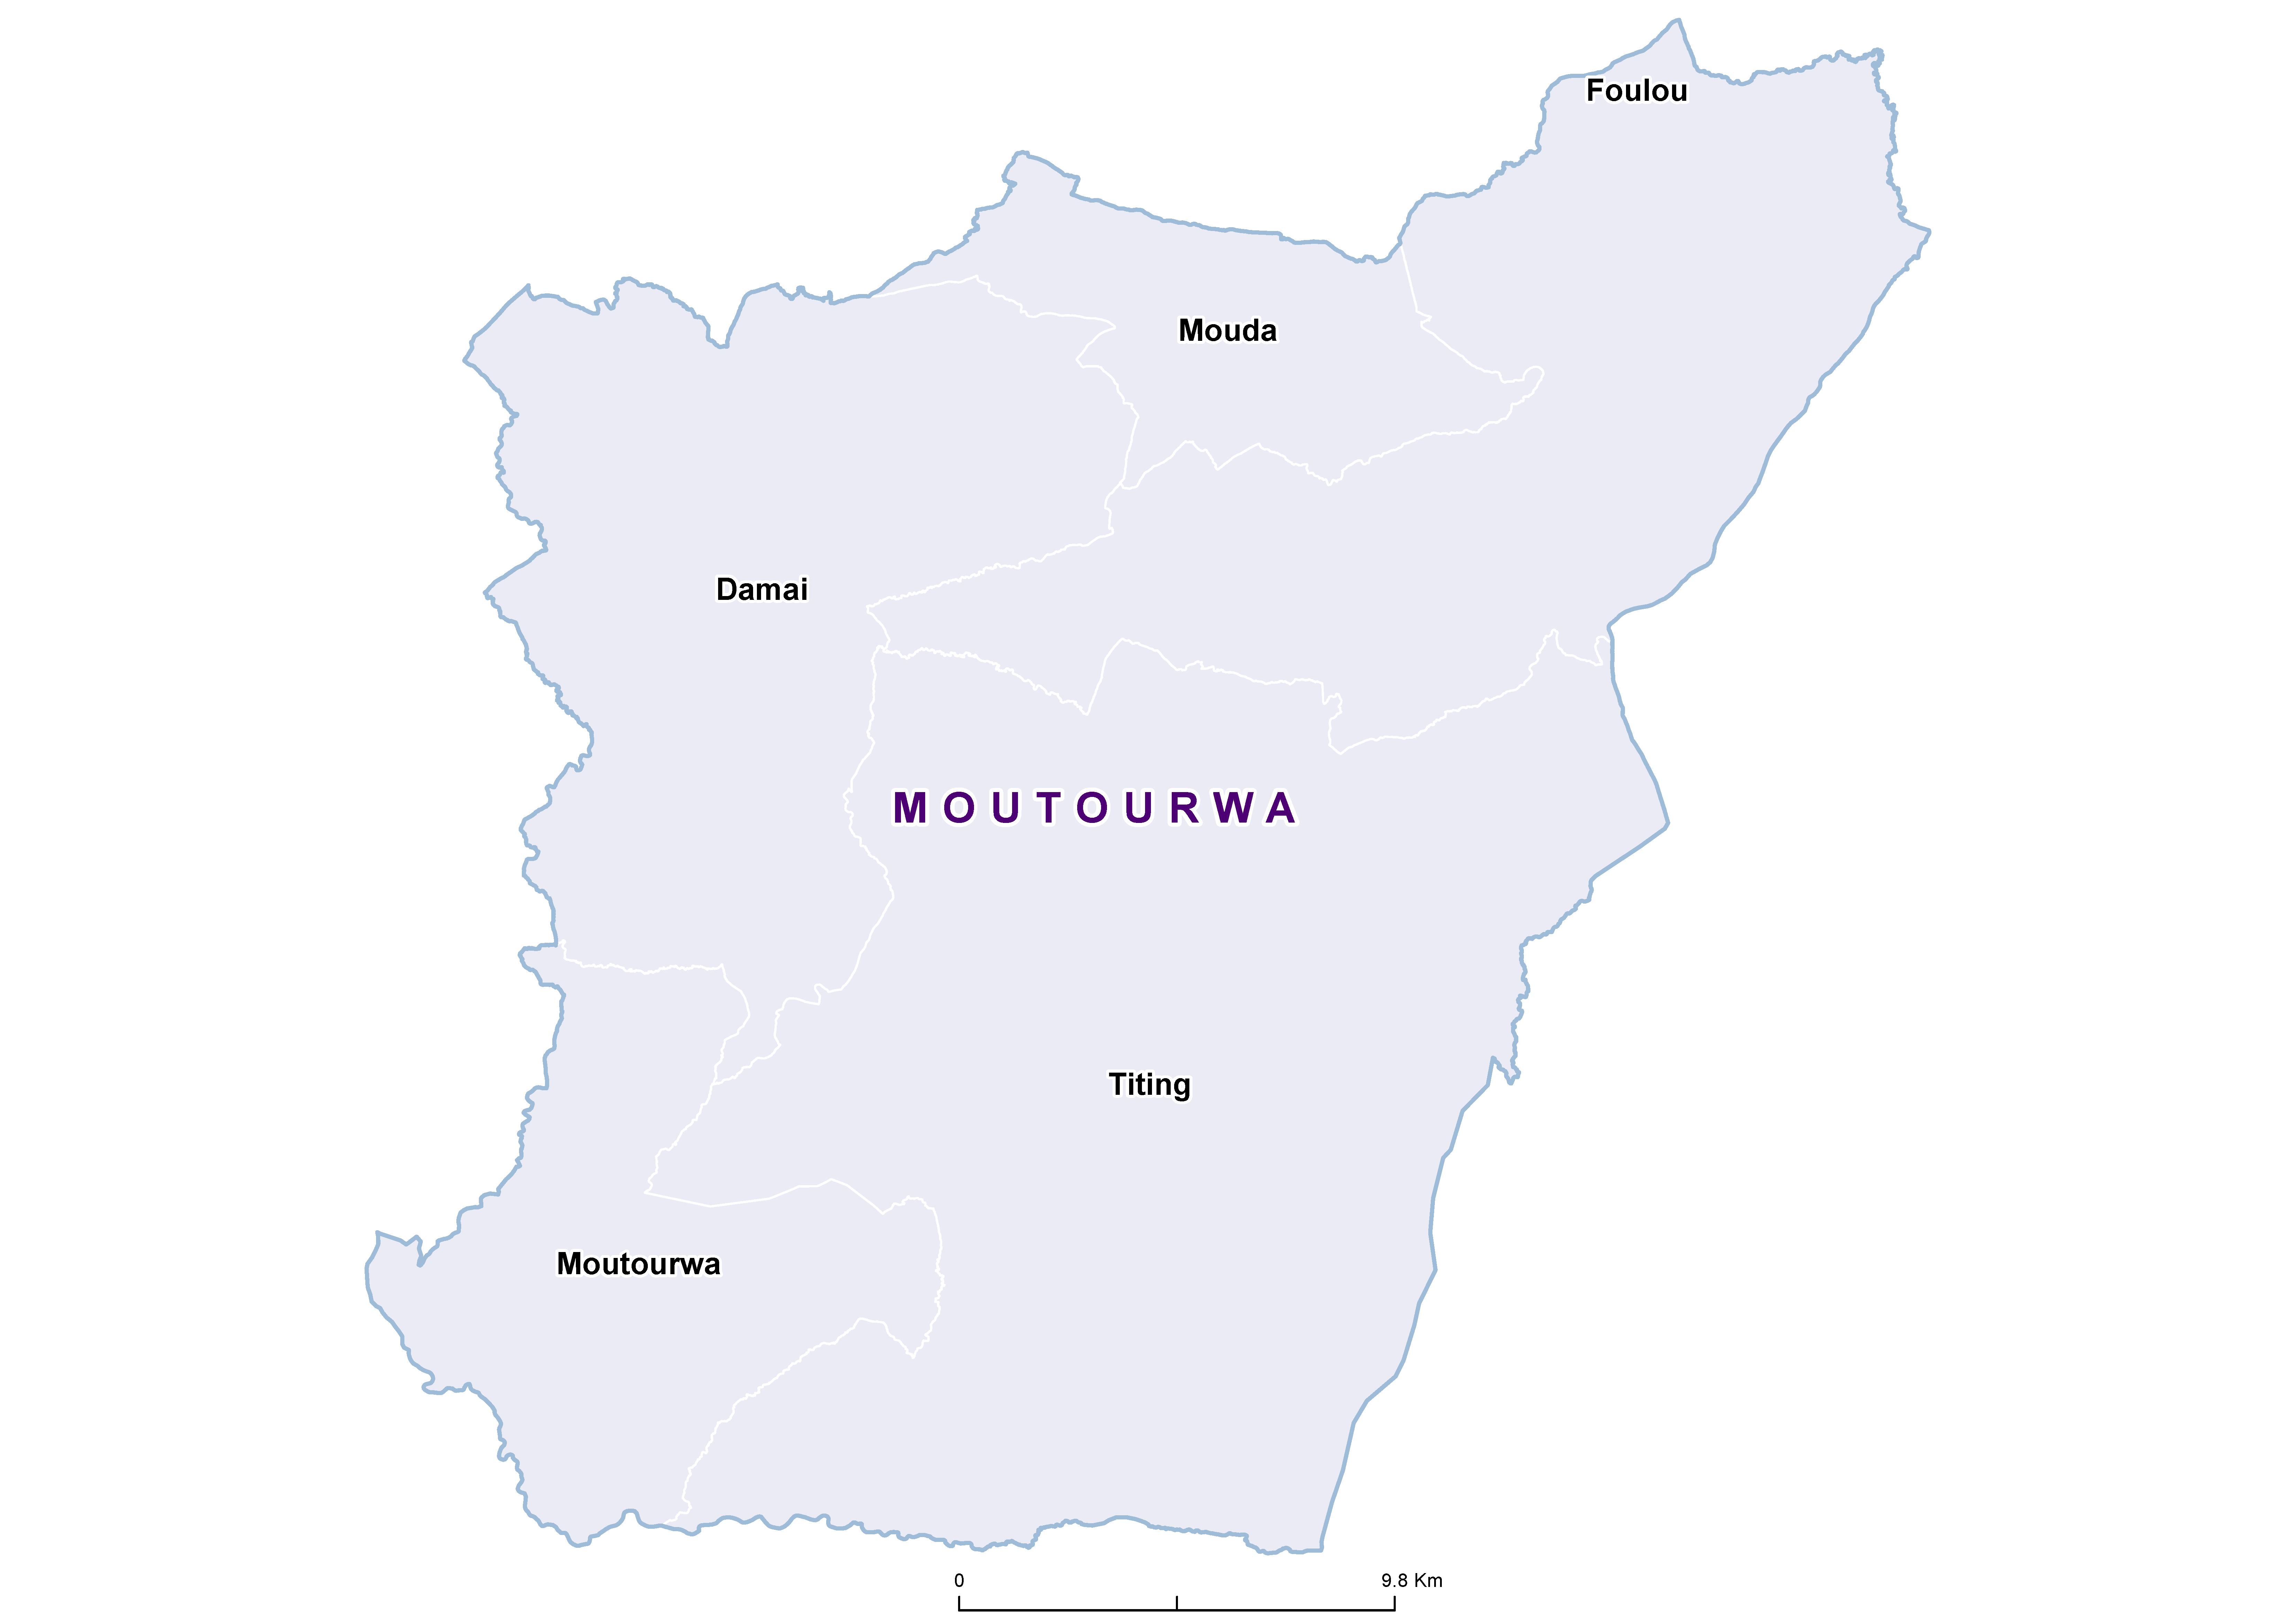 Moutourwa STH 20180001